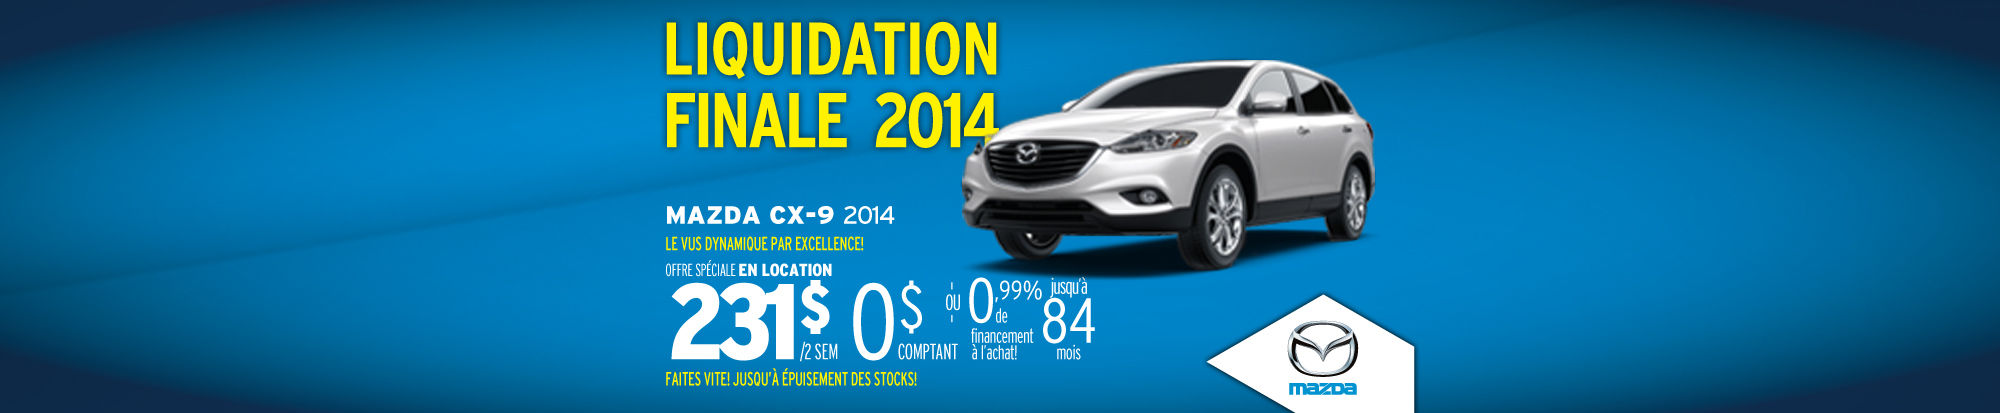 Mazda CX-9 liquidation